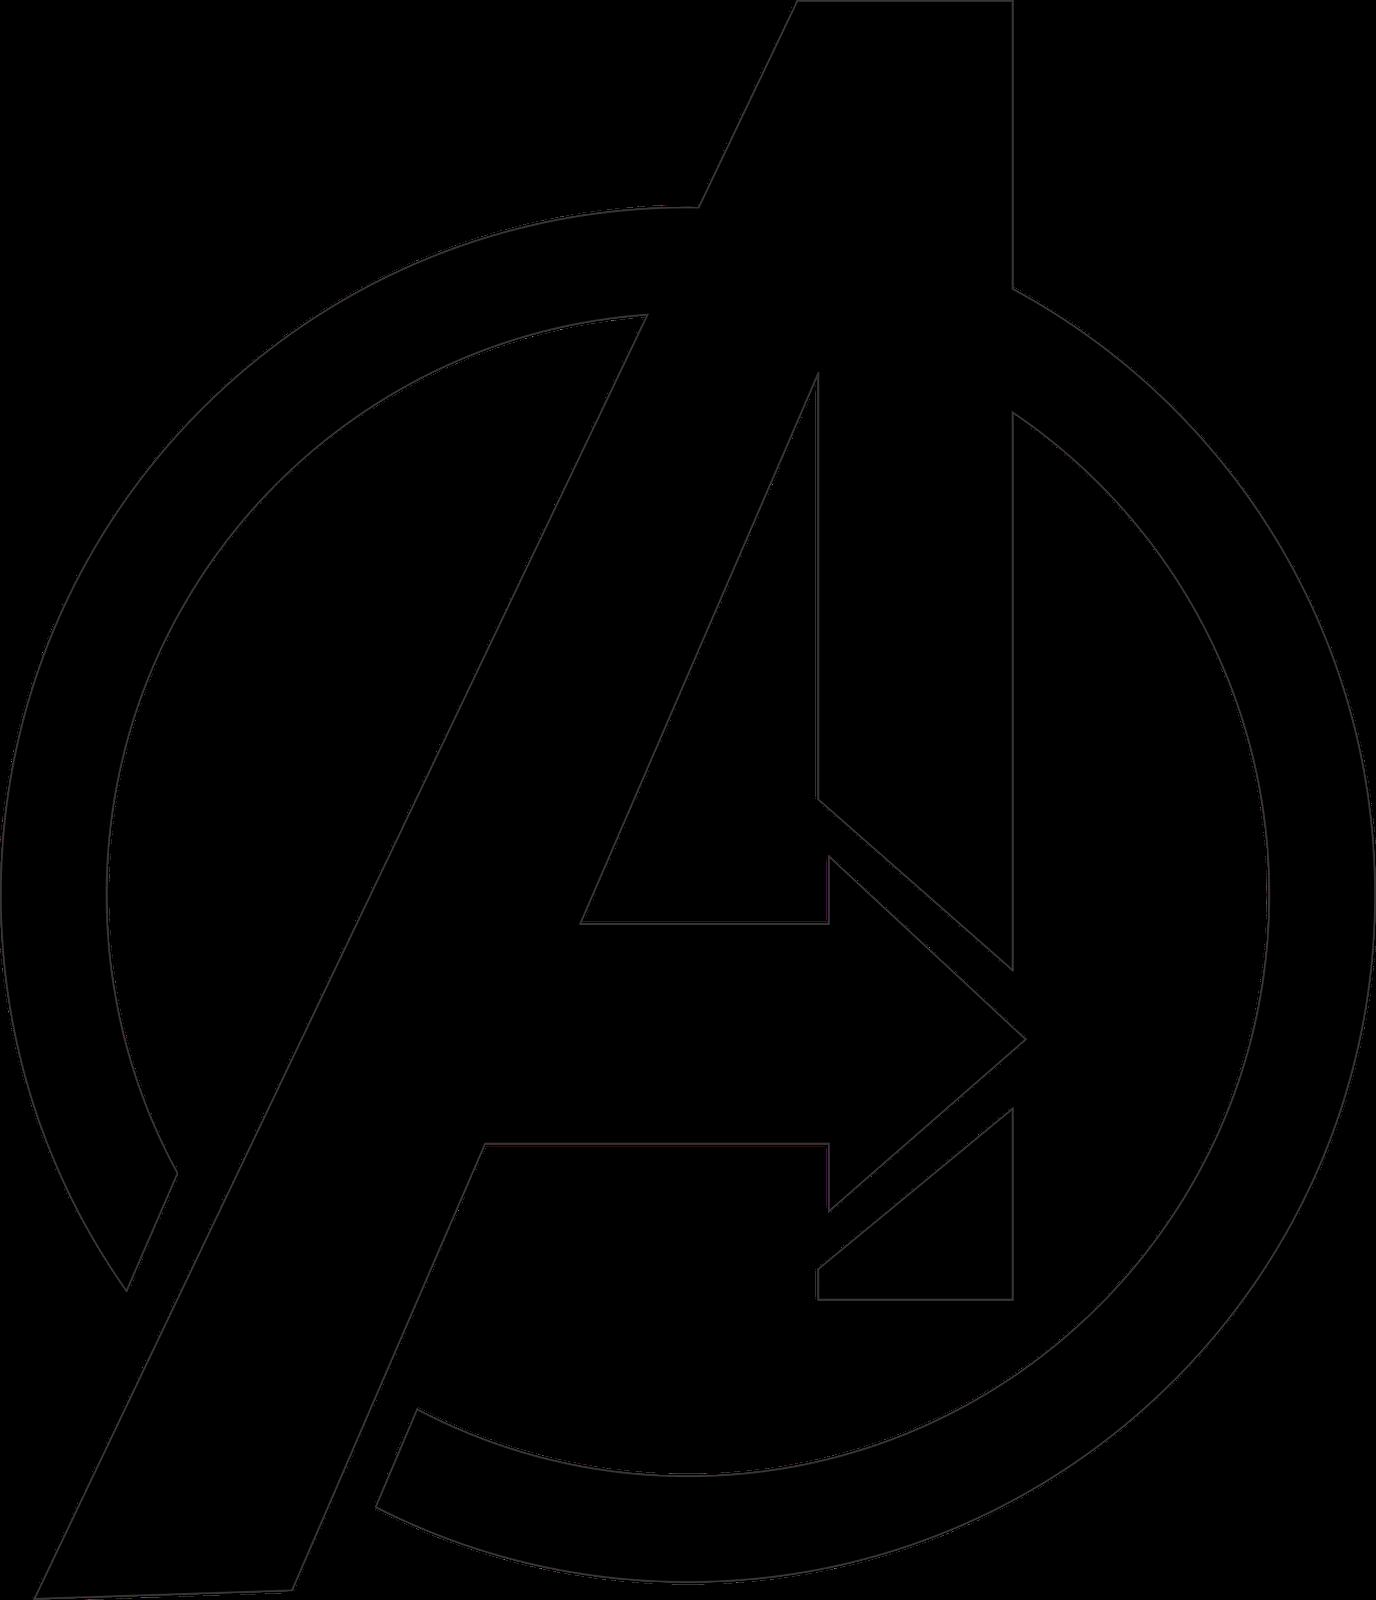 Image avengers logog disney wiki fandom powered by wikia avengers logog biocorpaavc Images